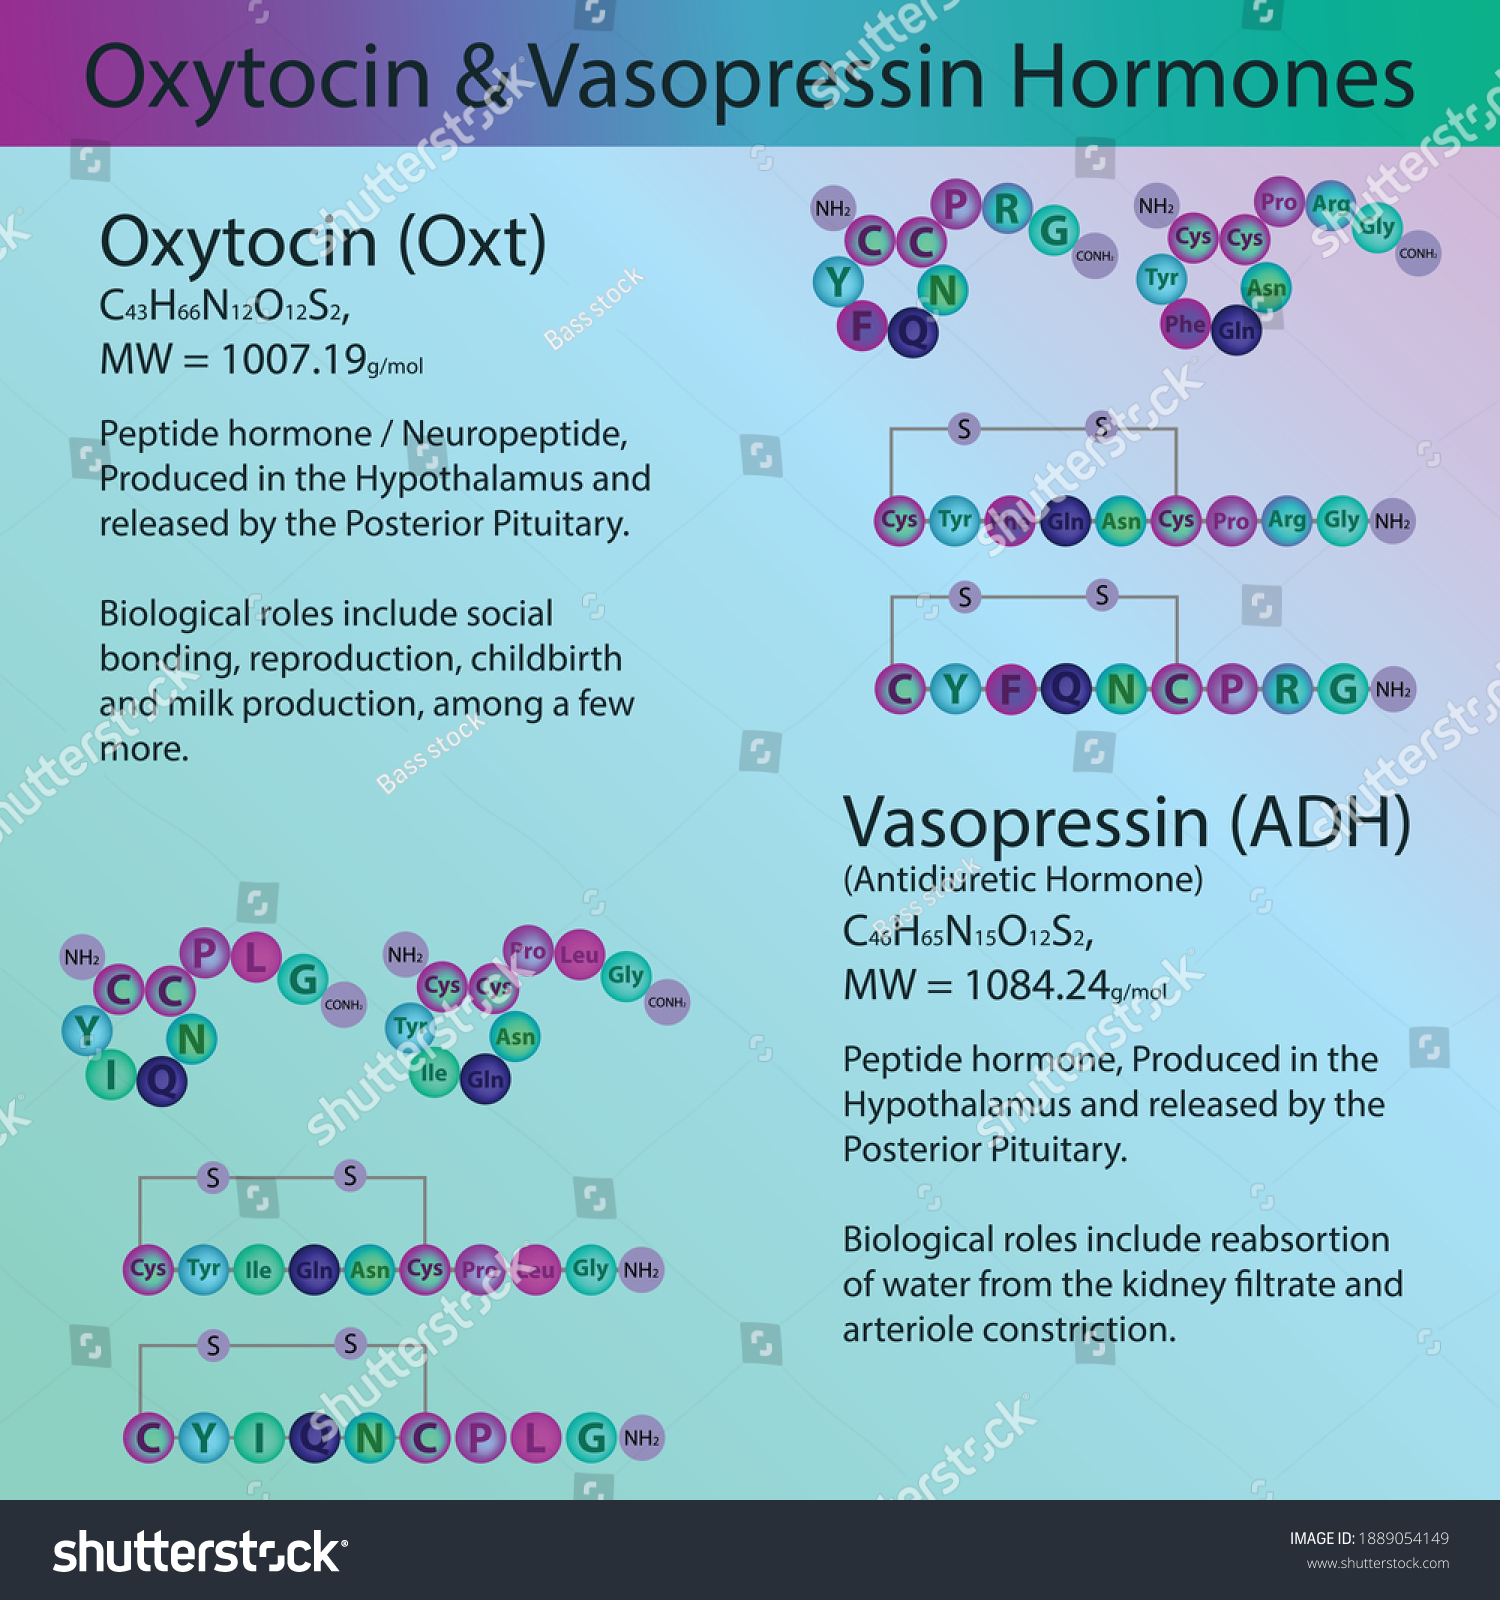 Vassopressin and Oxytocin, Posterior Pituitary Hormone peptide structure, Vector illustration educational medical information diagram. Endocrine molecule process for university, school, biochemistry